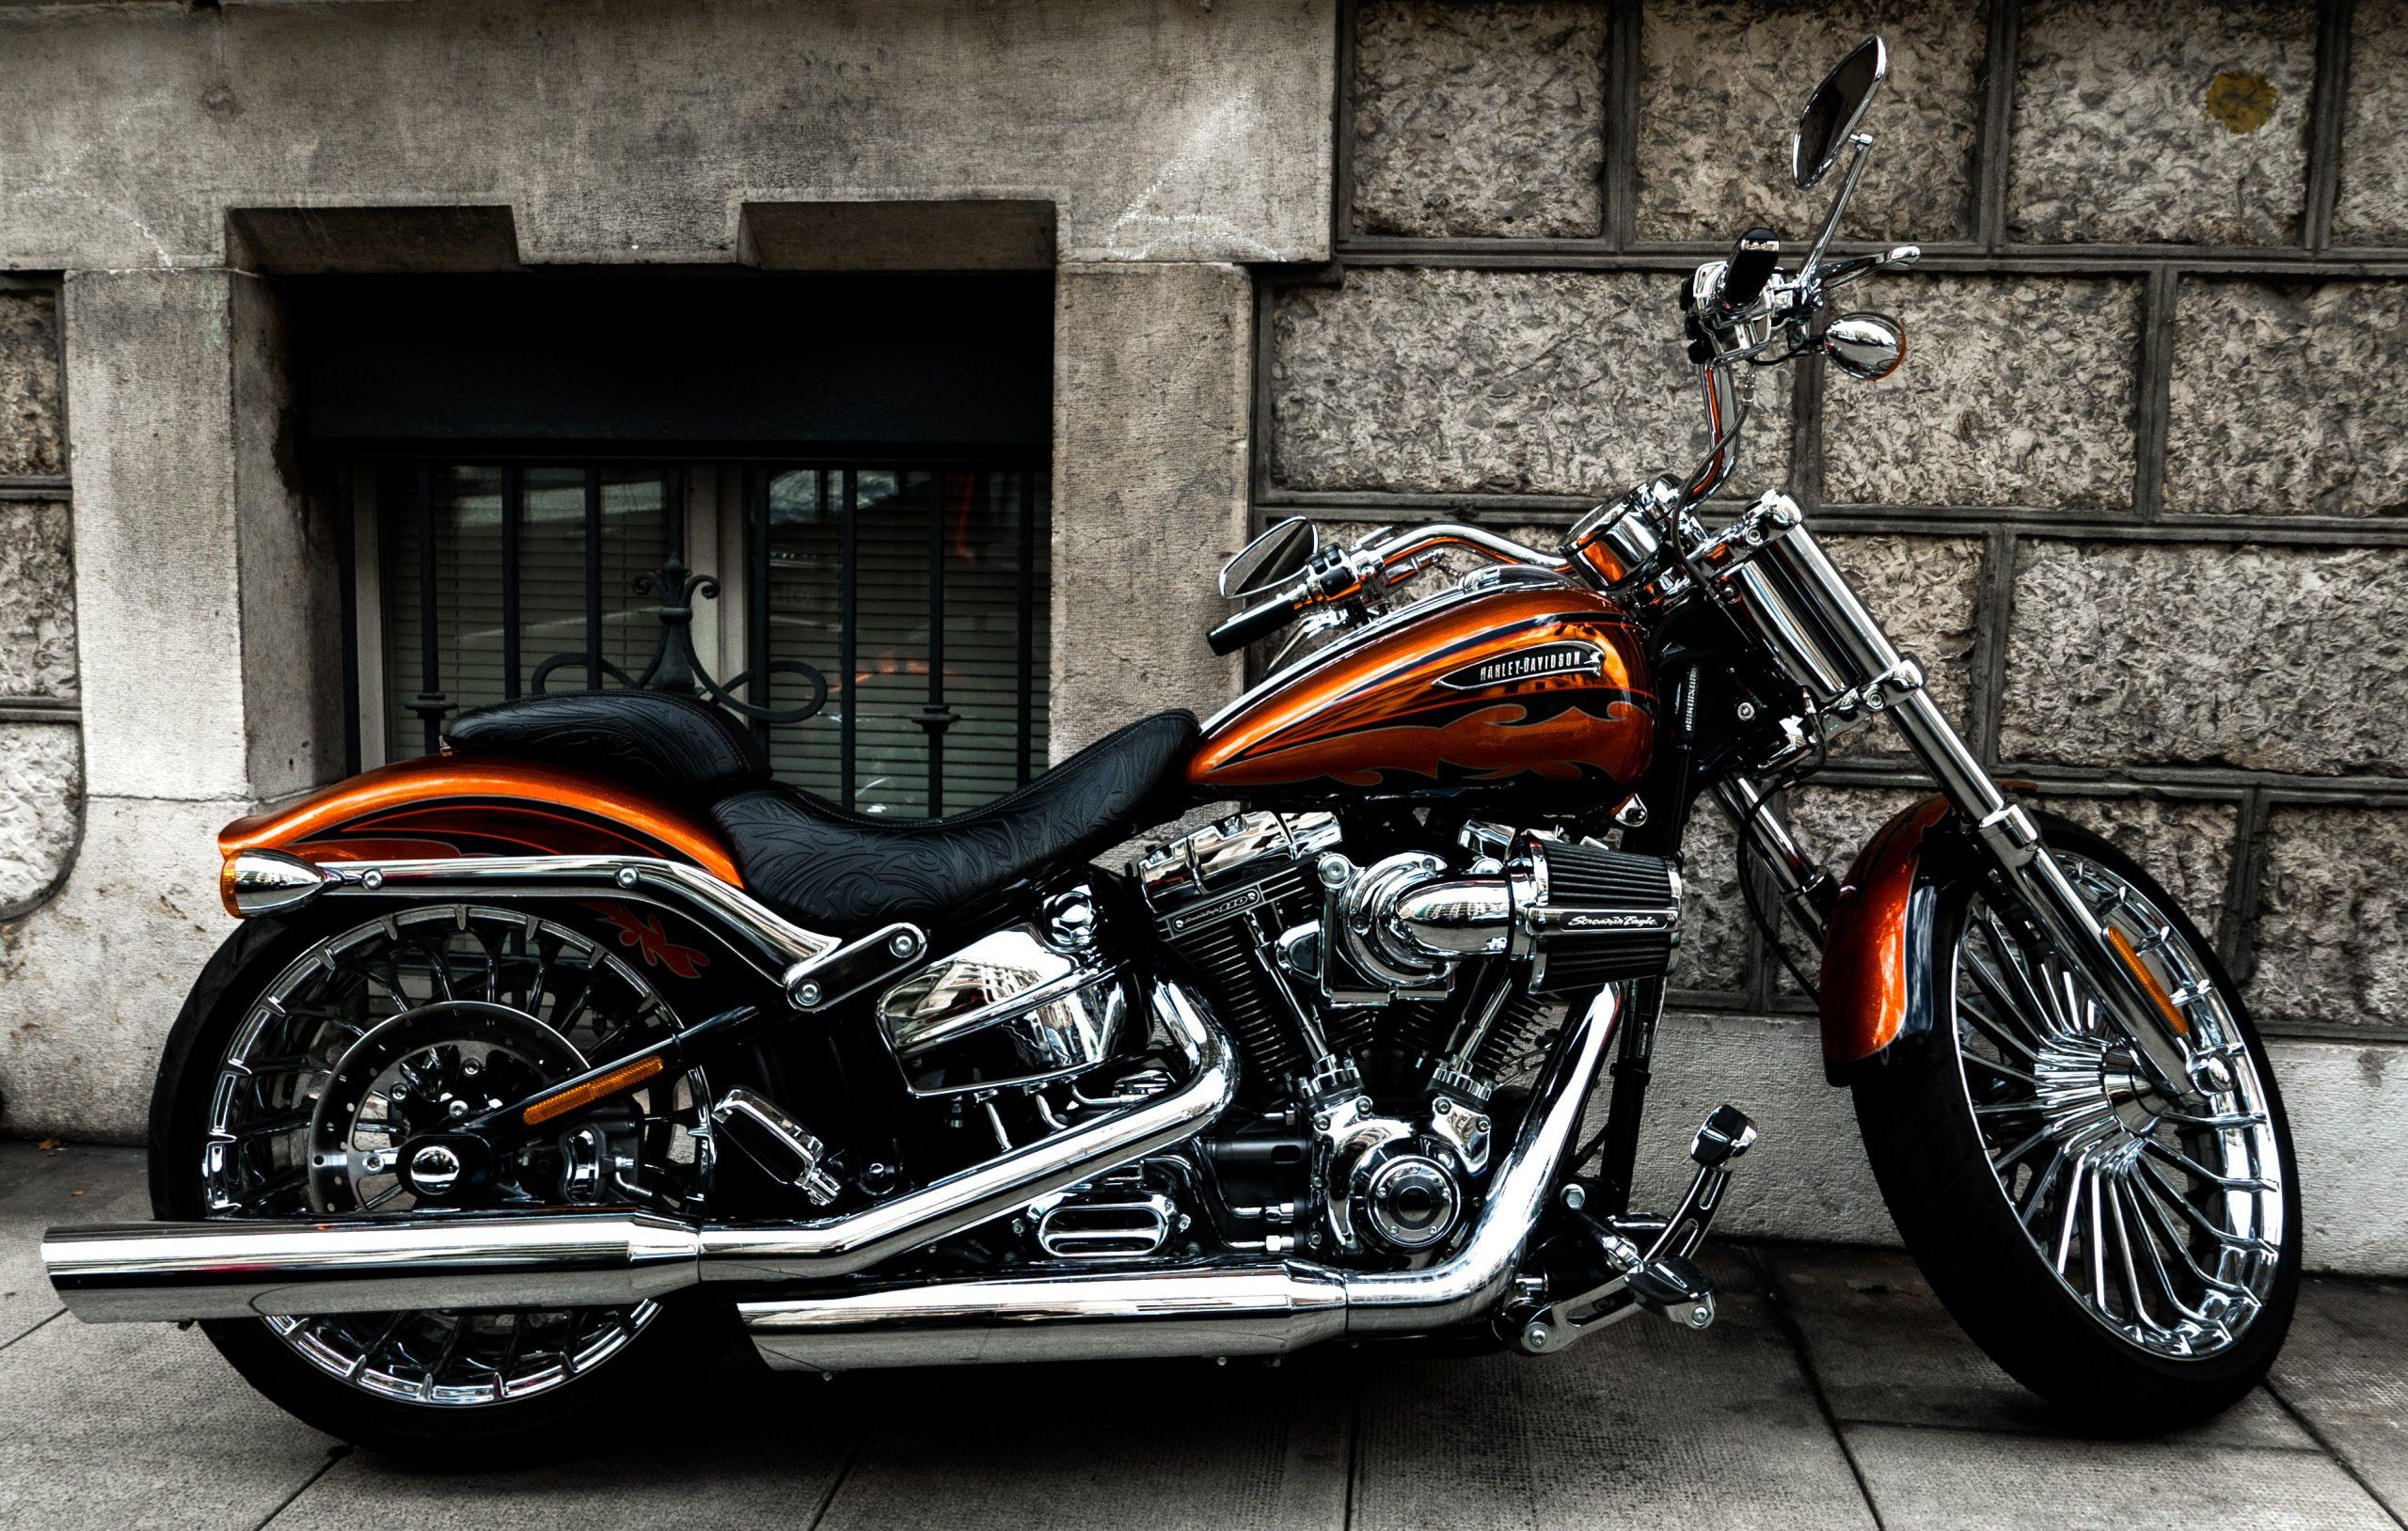 wallpaper Brown and black cruiser motorcycle